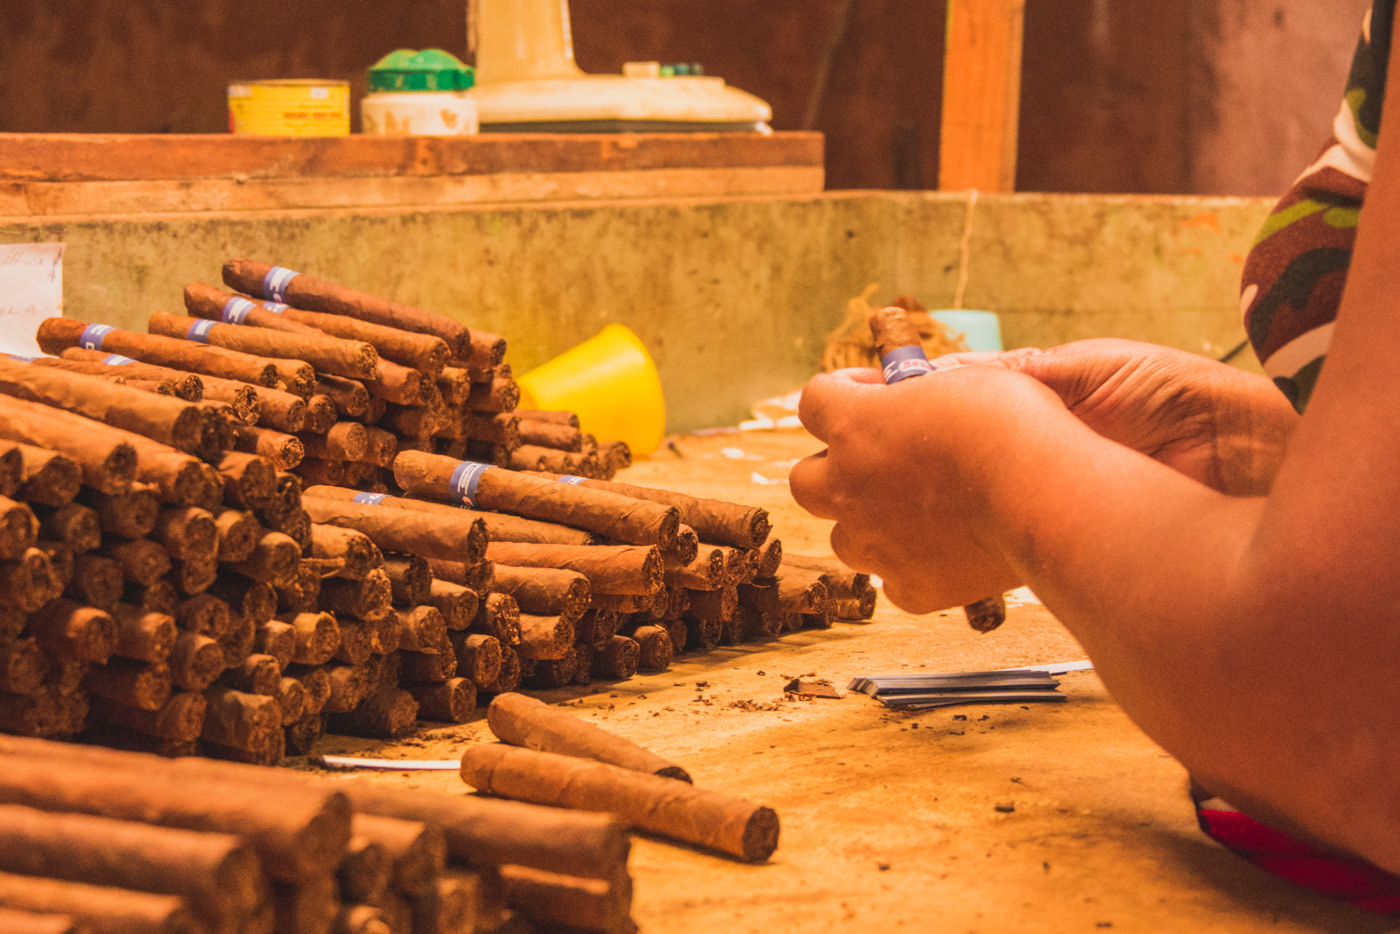 Frau in der Tabakfabrik etikettiert Ziggaren